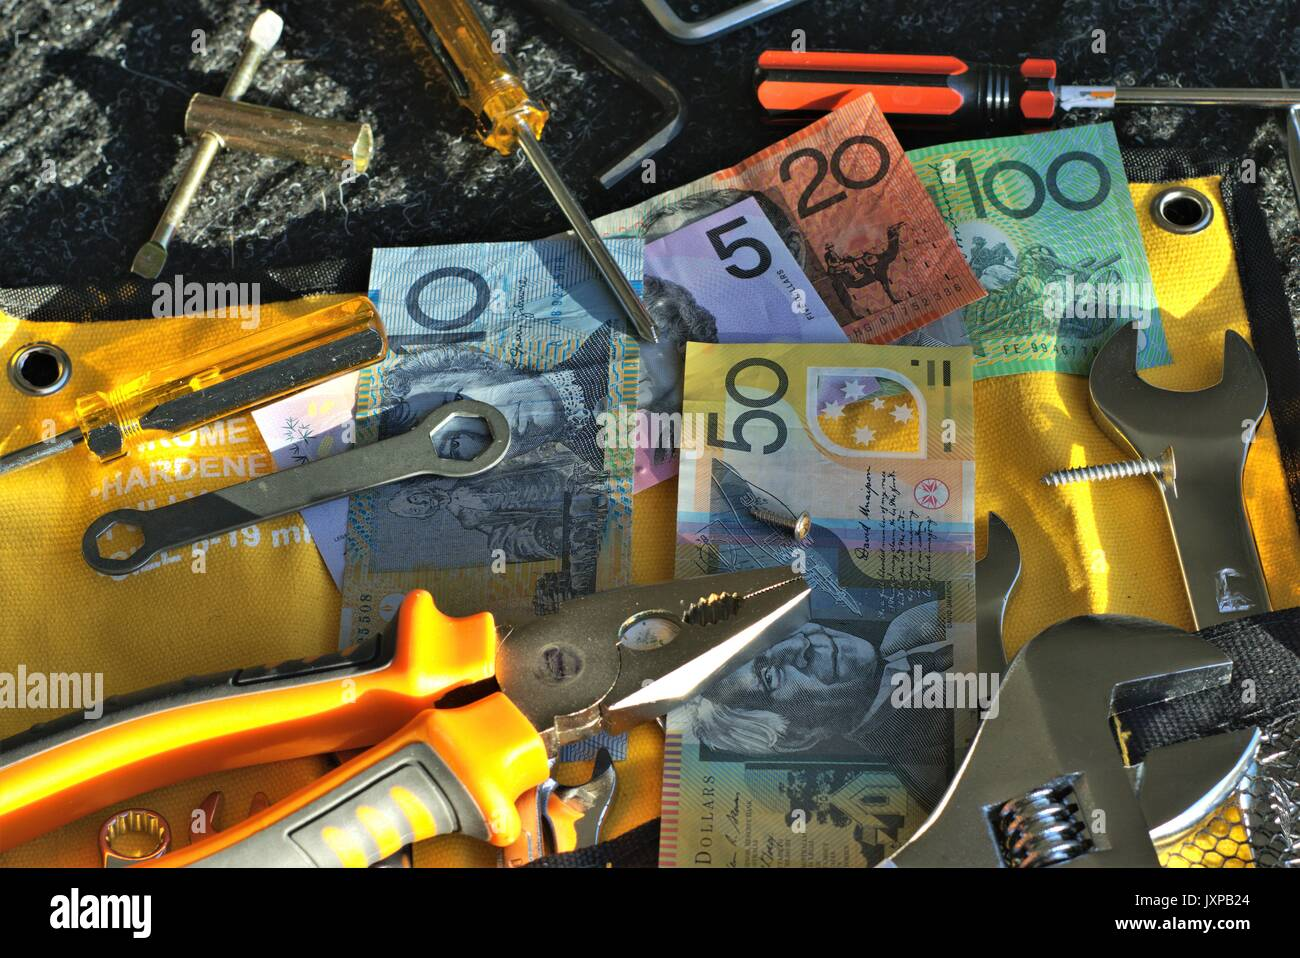 Australian money and tools of mechanic on black mat in direct sunlight - Stock Image